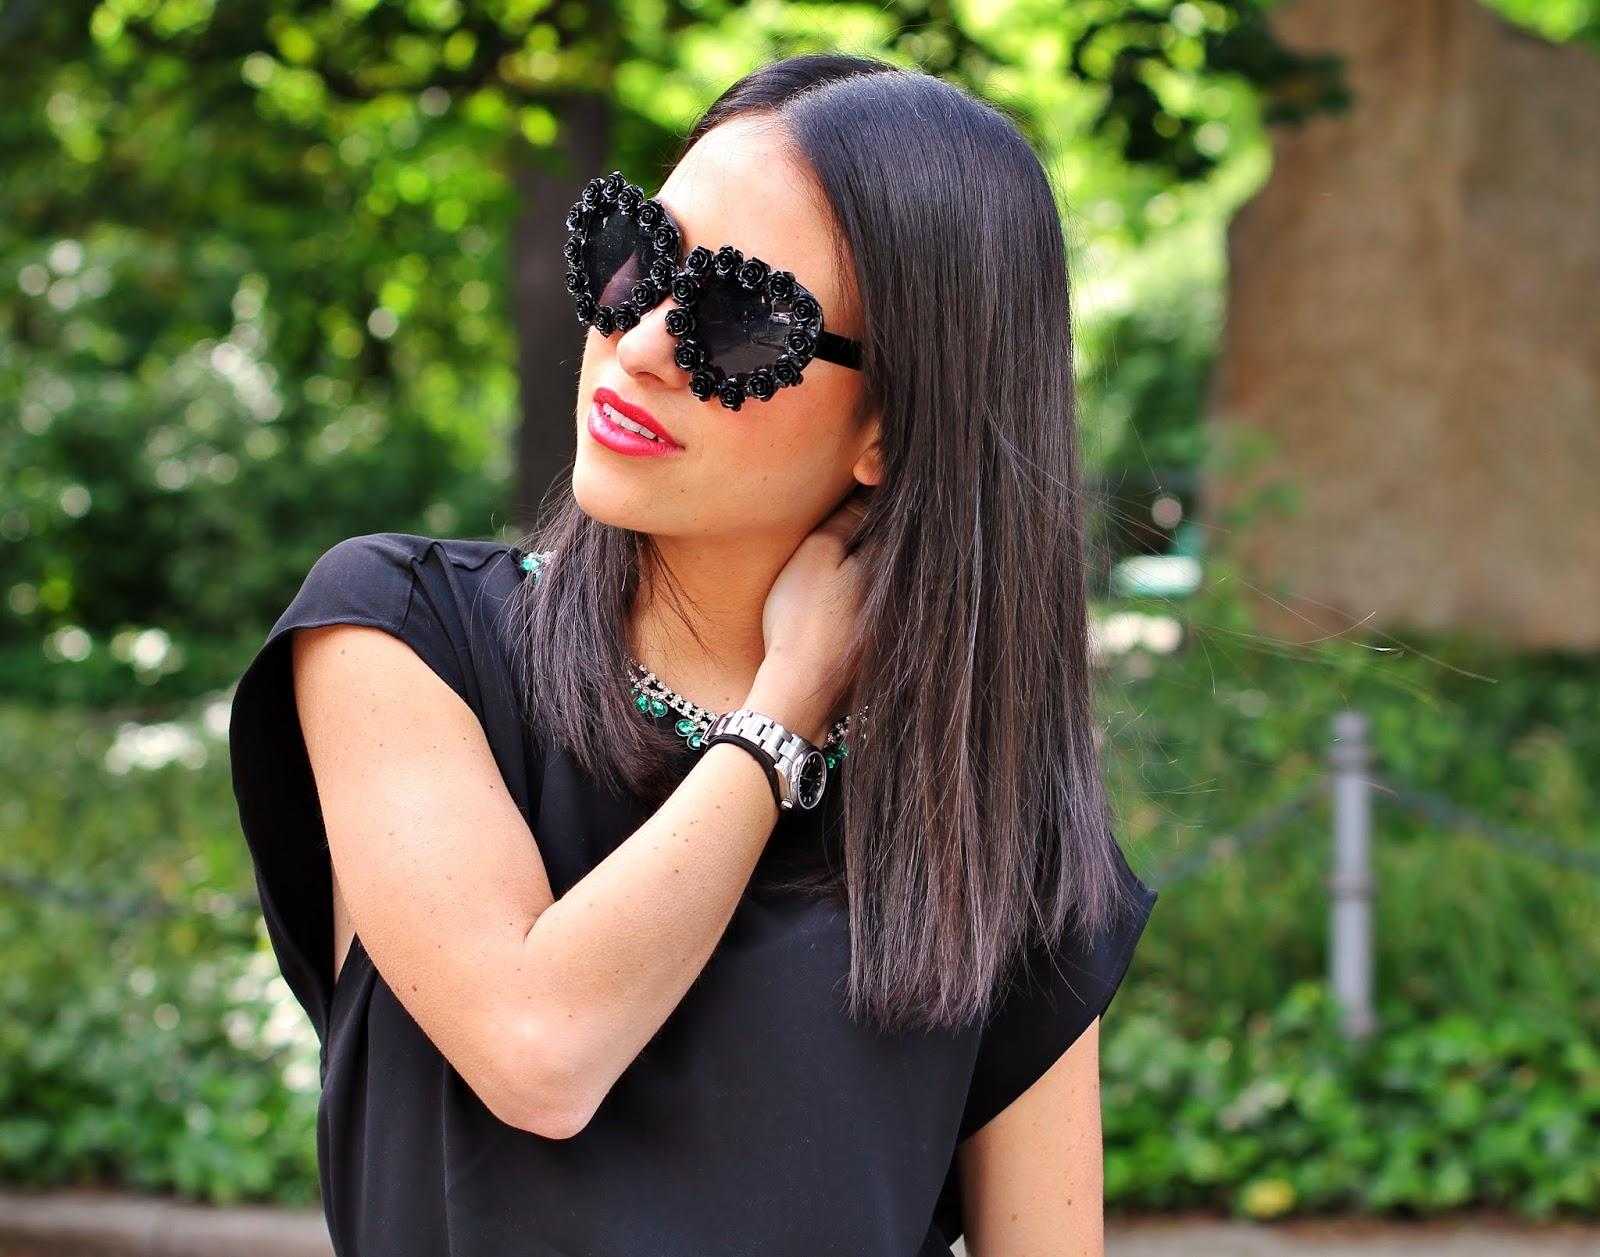 primark_sunglasses_sunnies_black2014_francesca_castellano_chicetoile_